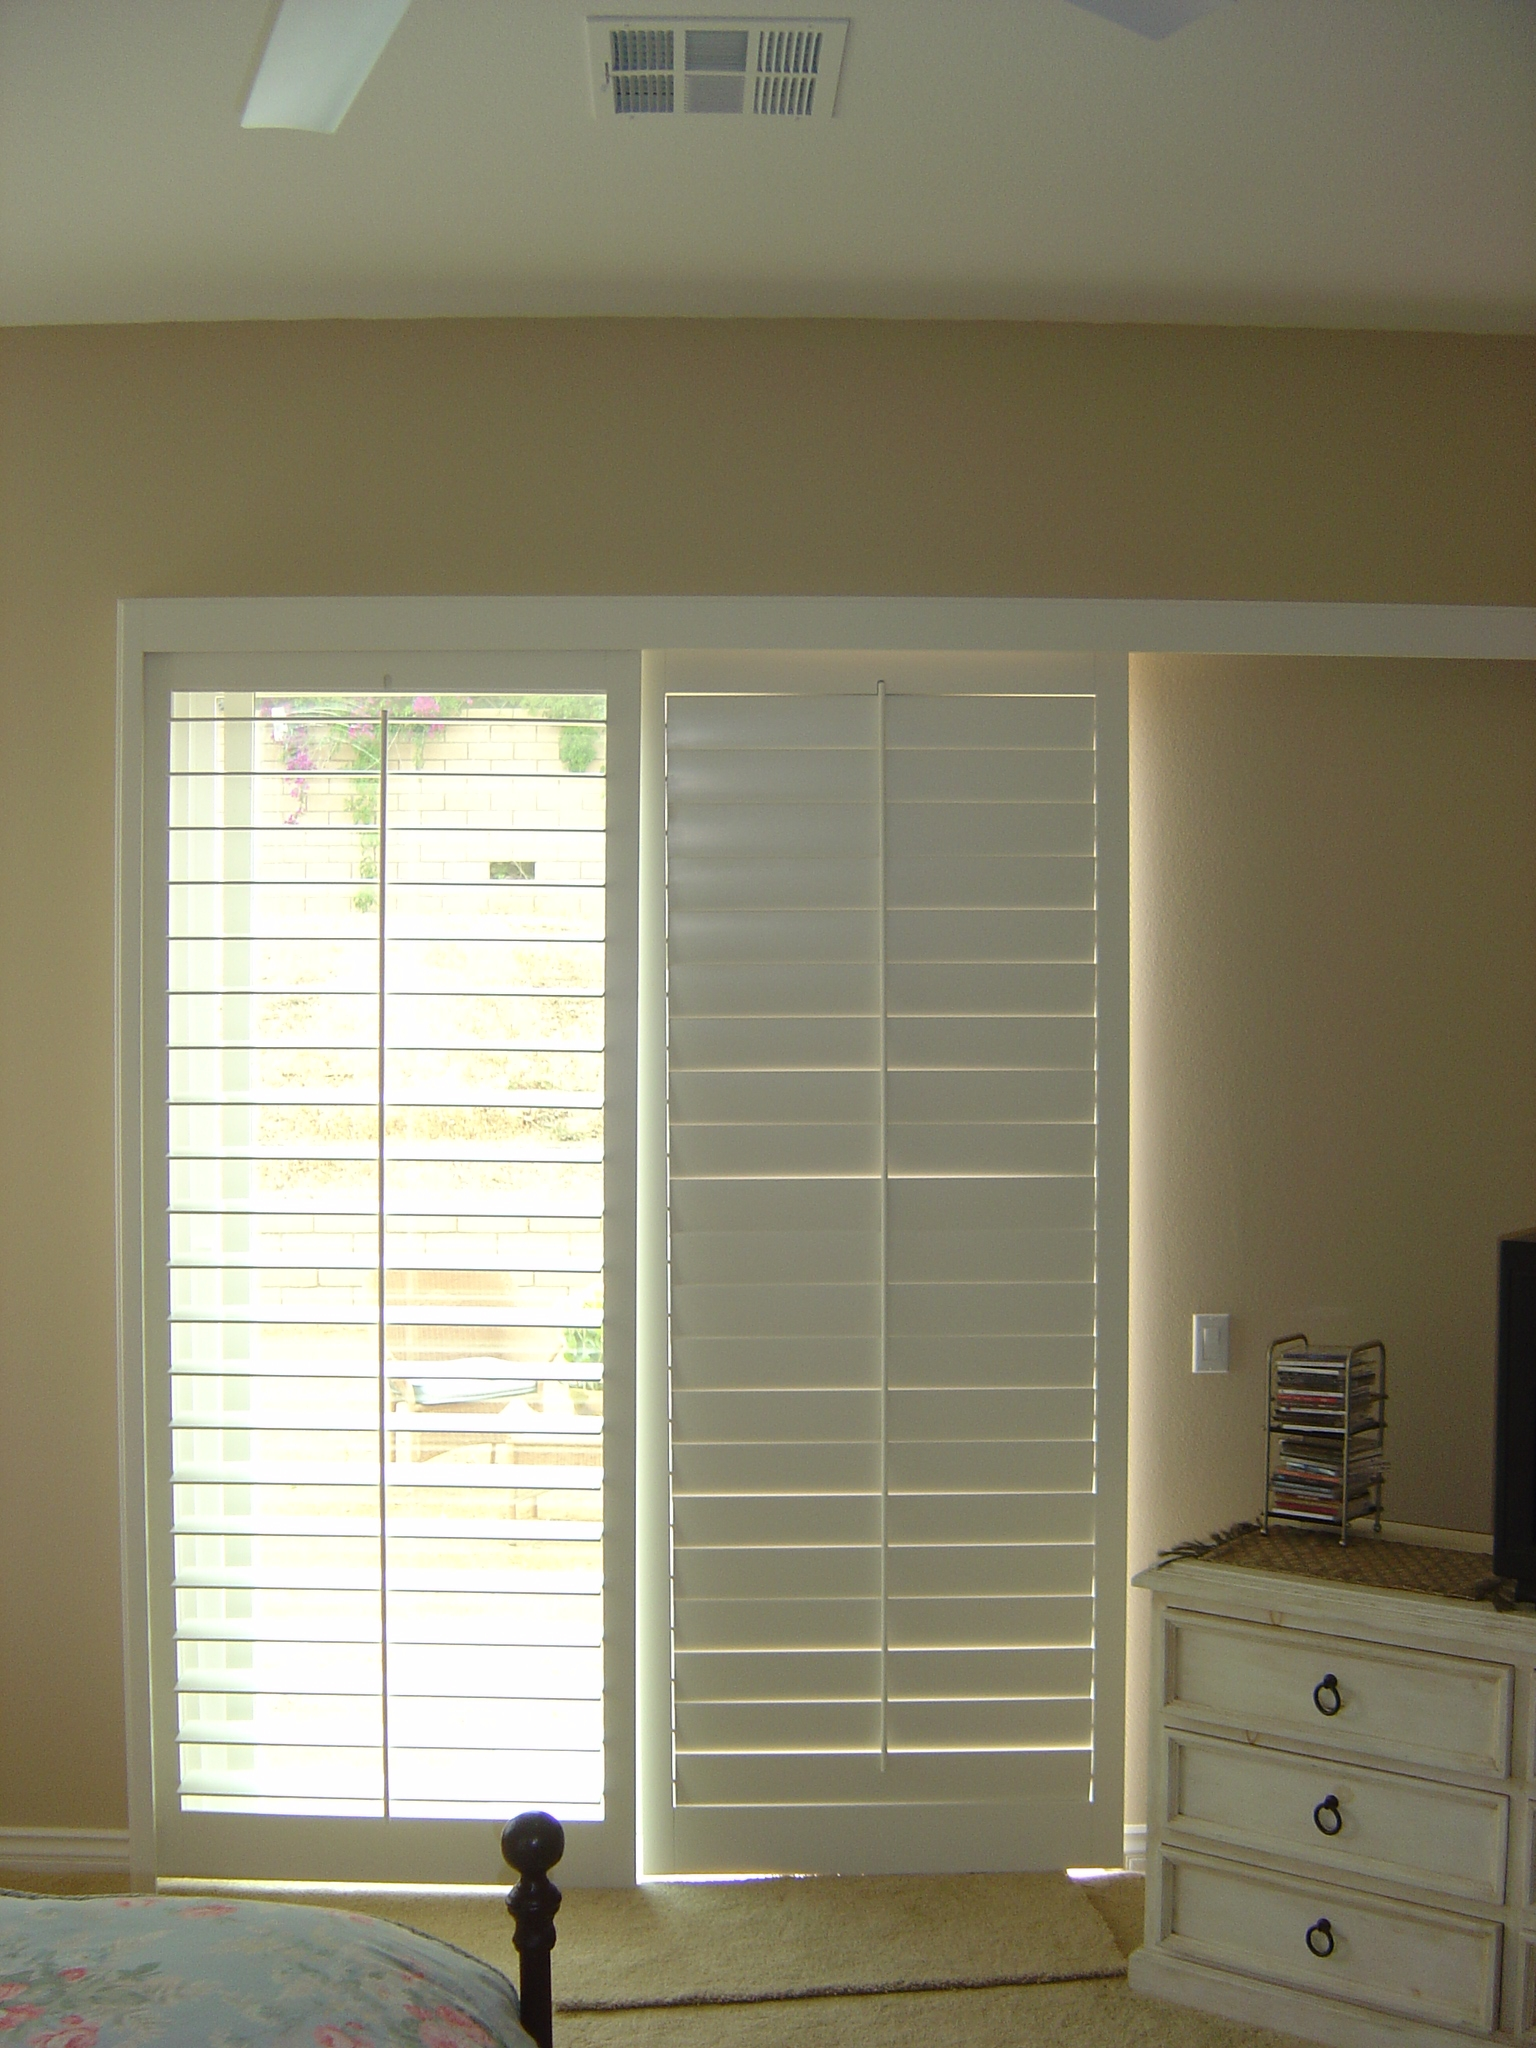 Ideas For Sliding Glass Door Window CoveringsIdeas For Sliding Glass Door Window Coverings